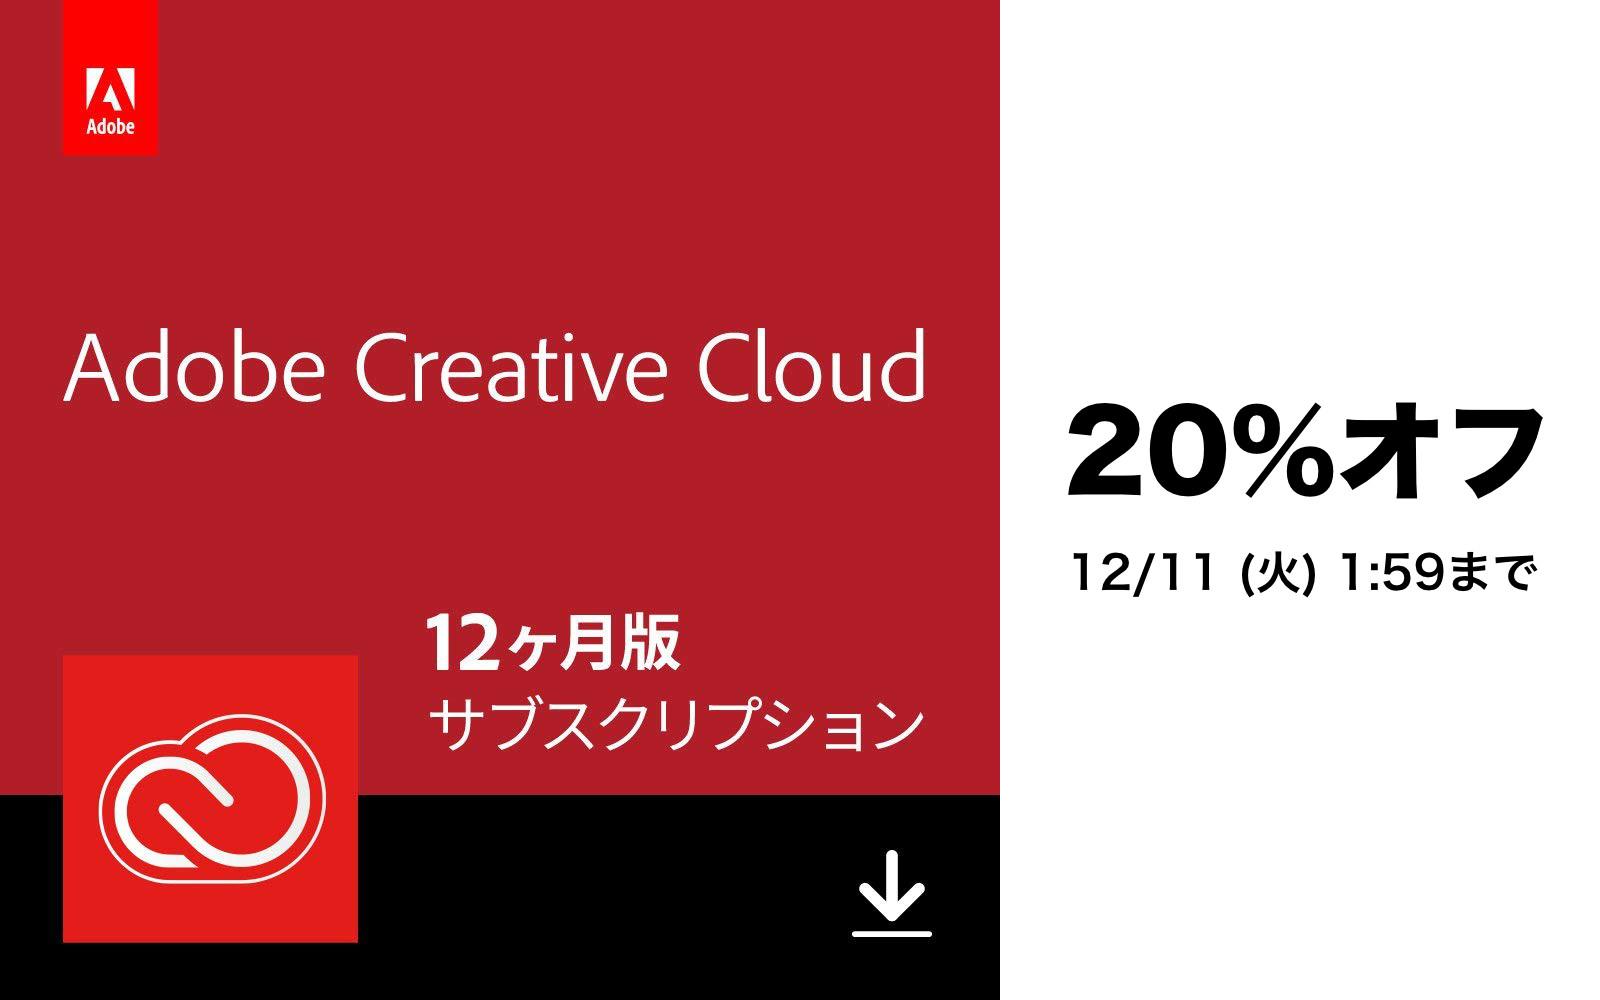 Adobe-CC-Complete-Sale.jpg